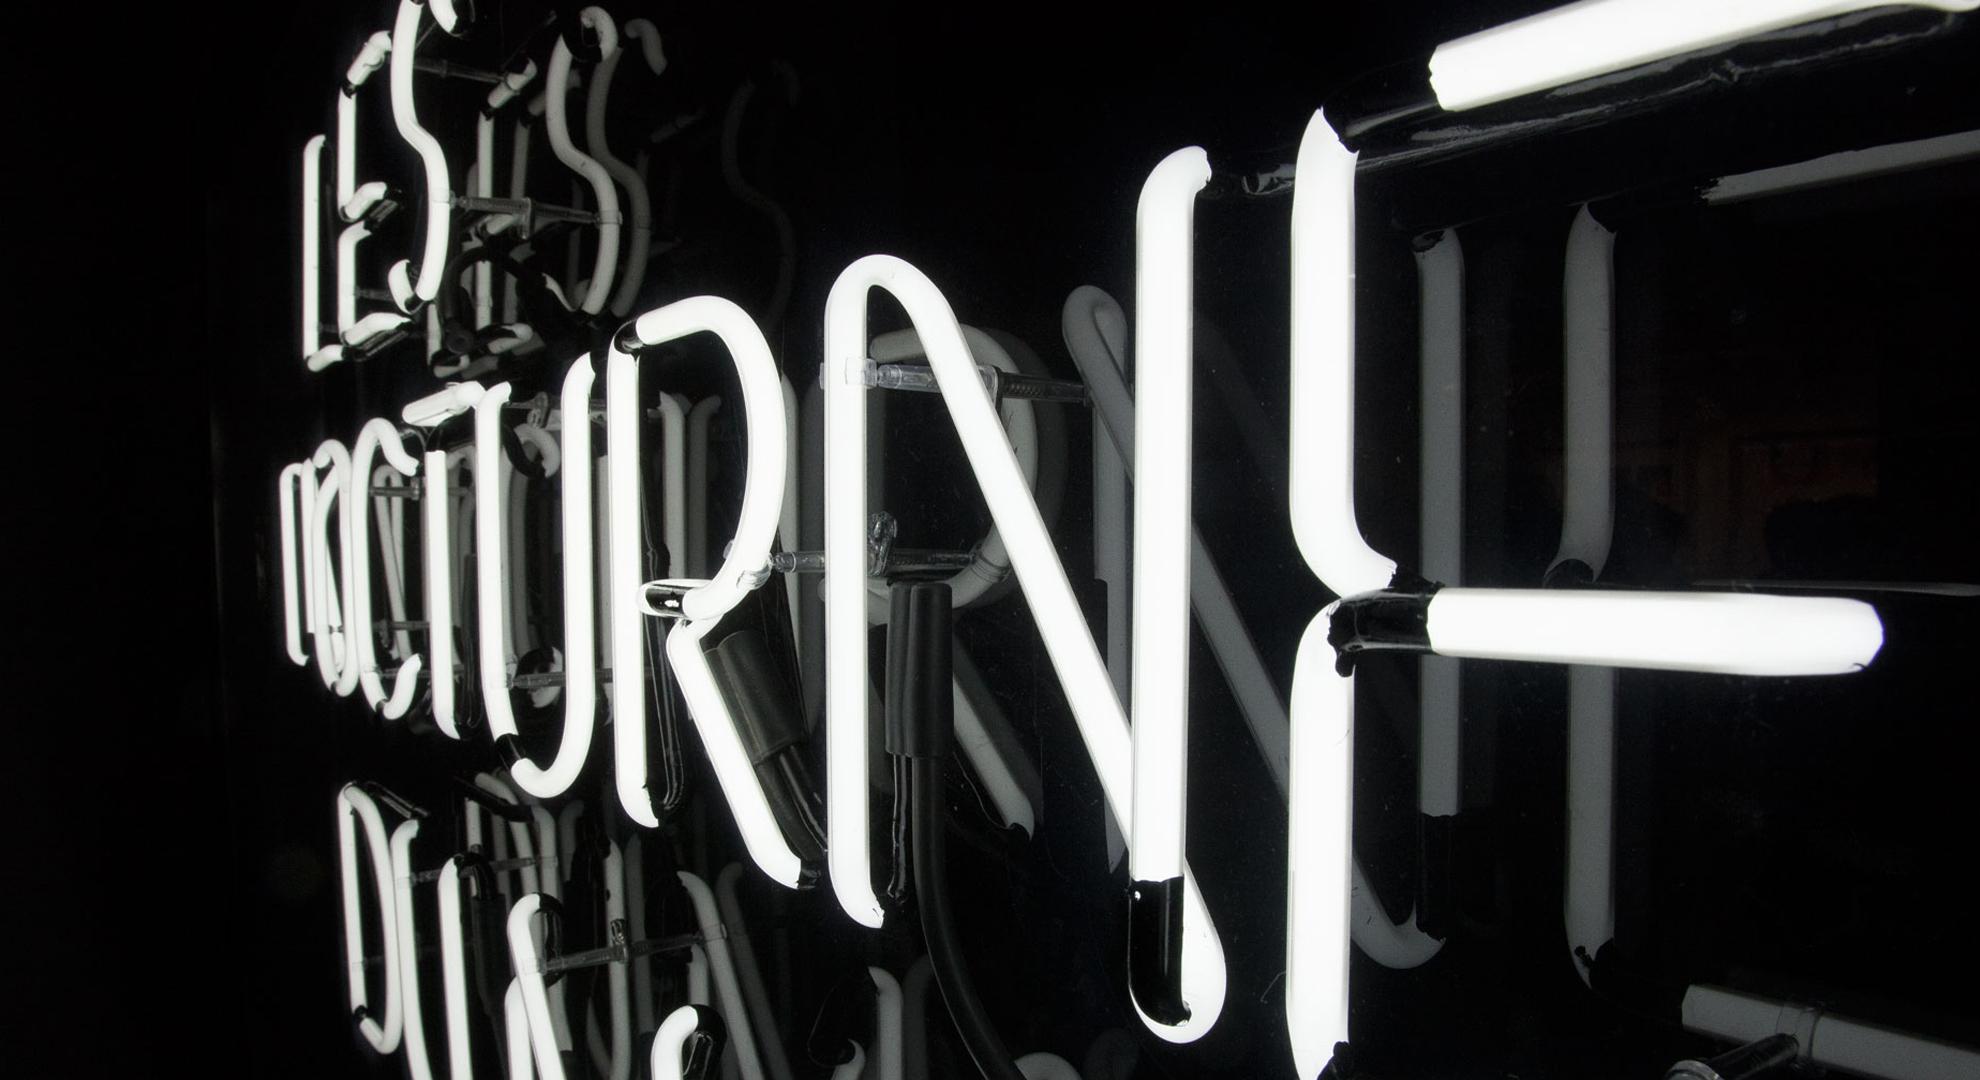 alix+neyvoz+nocturnes+musée+art+contemporain+neon+design+party+1.jpg